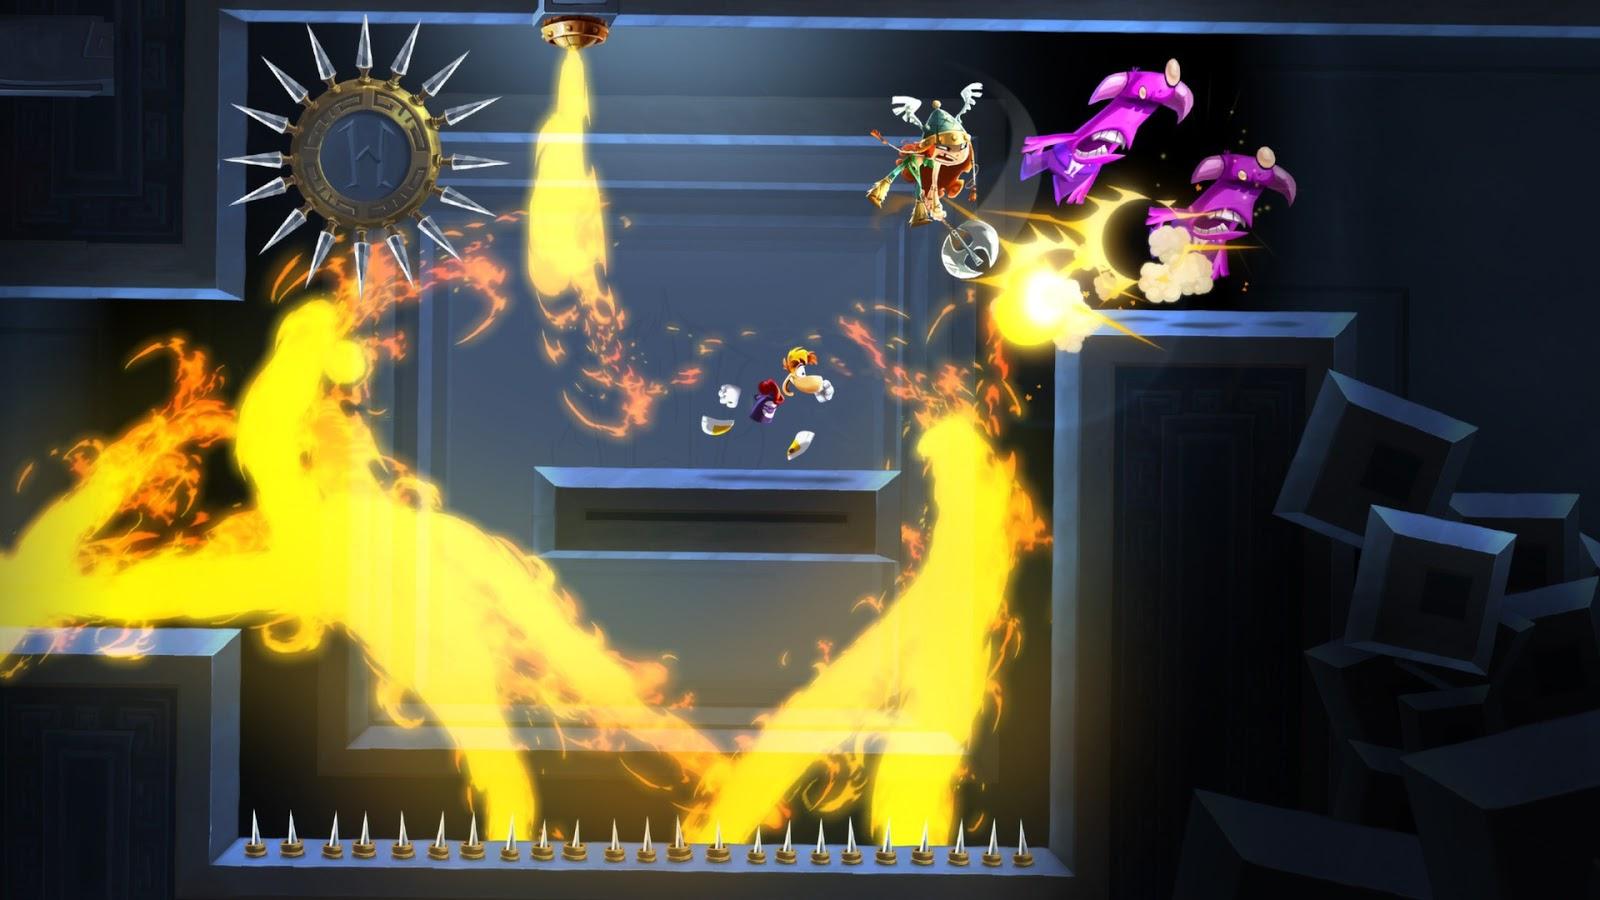 Rayman Legends ESPAÑOL PC Descargar Full (PROPHET) + REPACK 1 DVD5 (JPW) 3